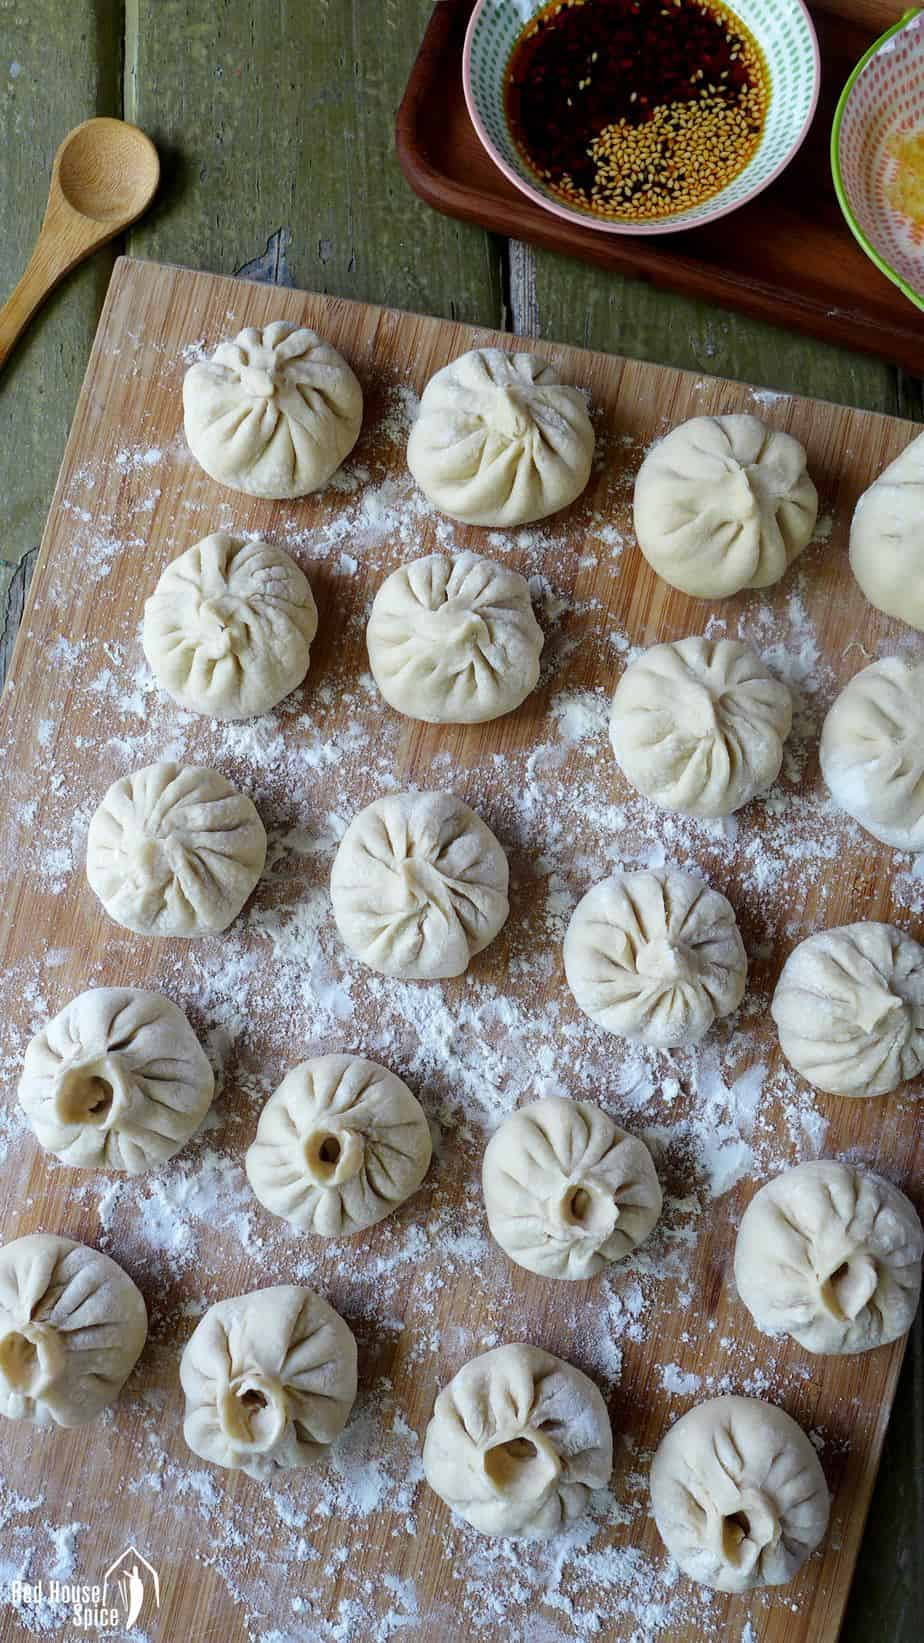 Freshly assembled Sheng Jian Bao (pan-fried pork buns) on a chopping board ready to be cooked.